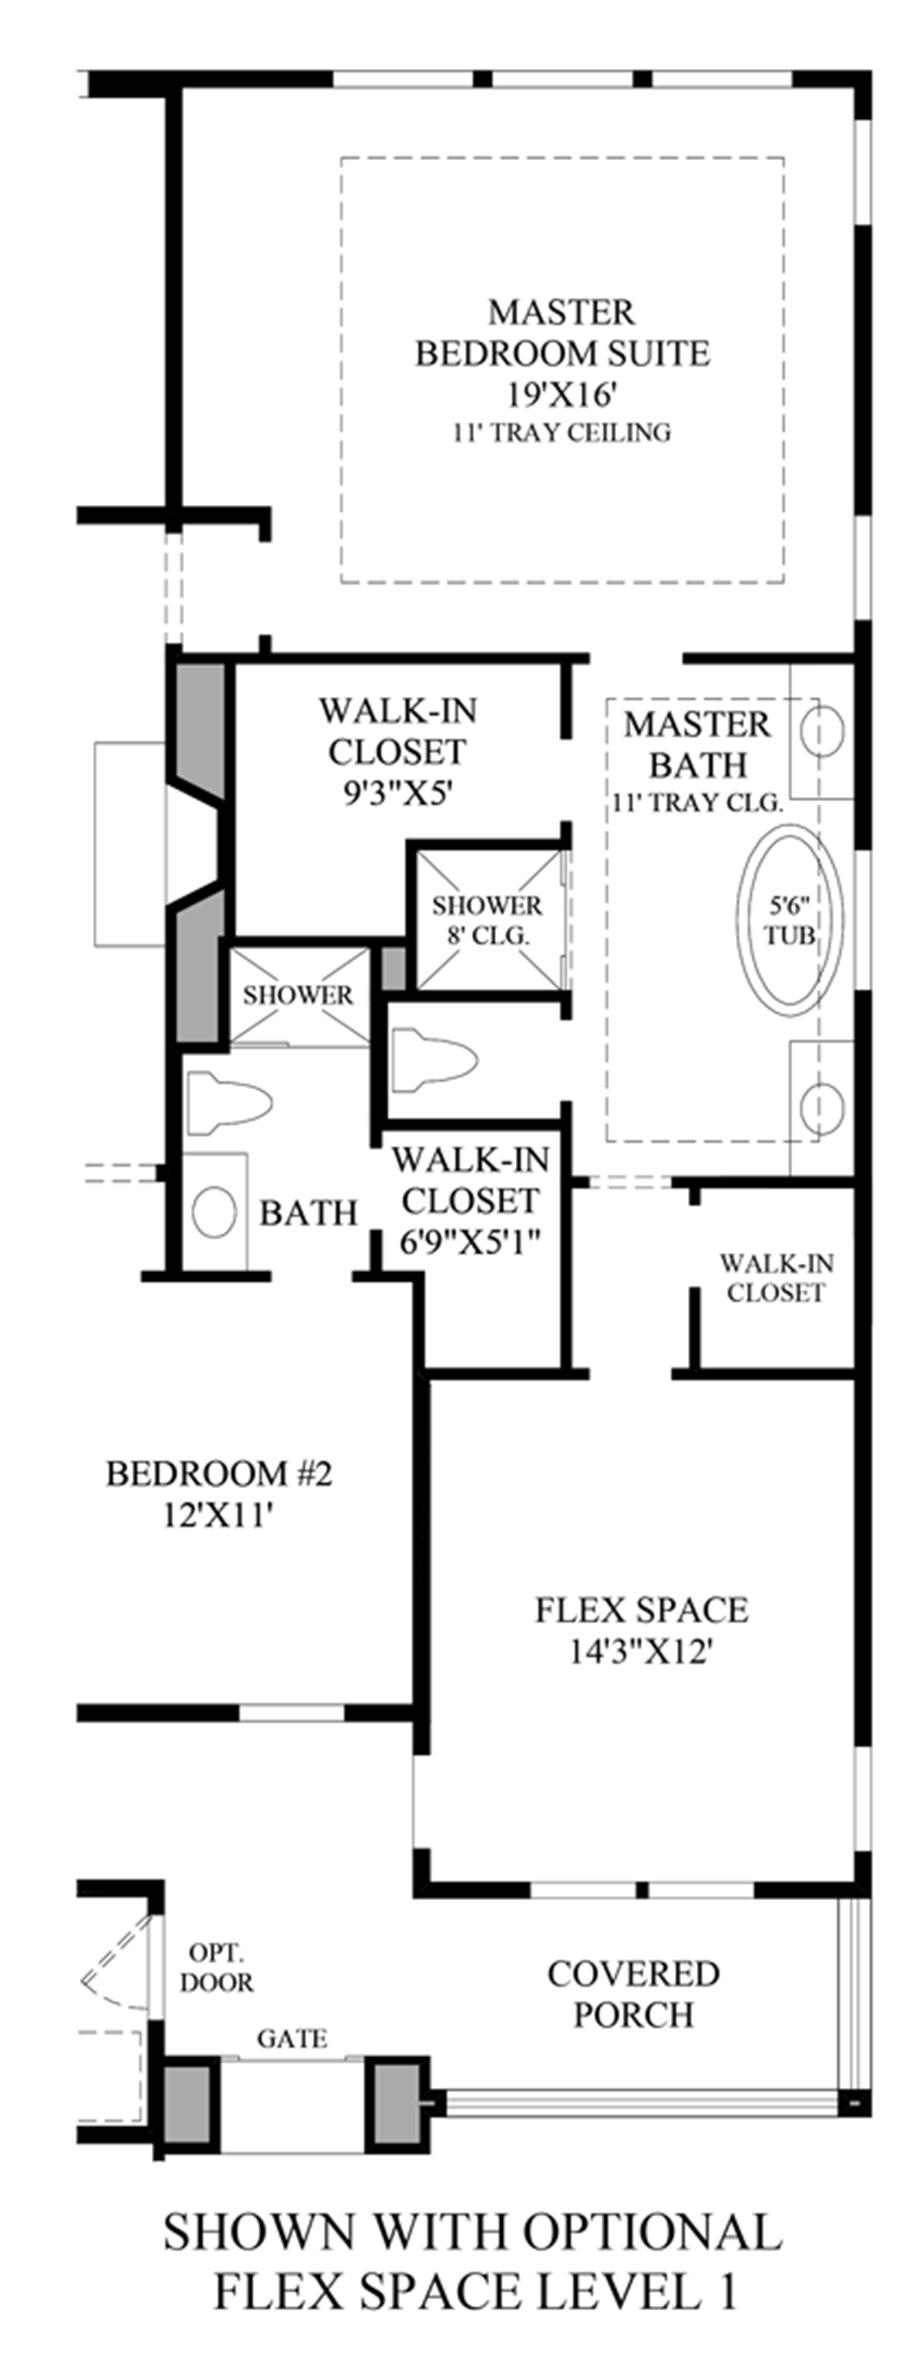 Optional Flex Space Level Floor Plan